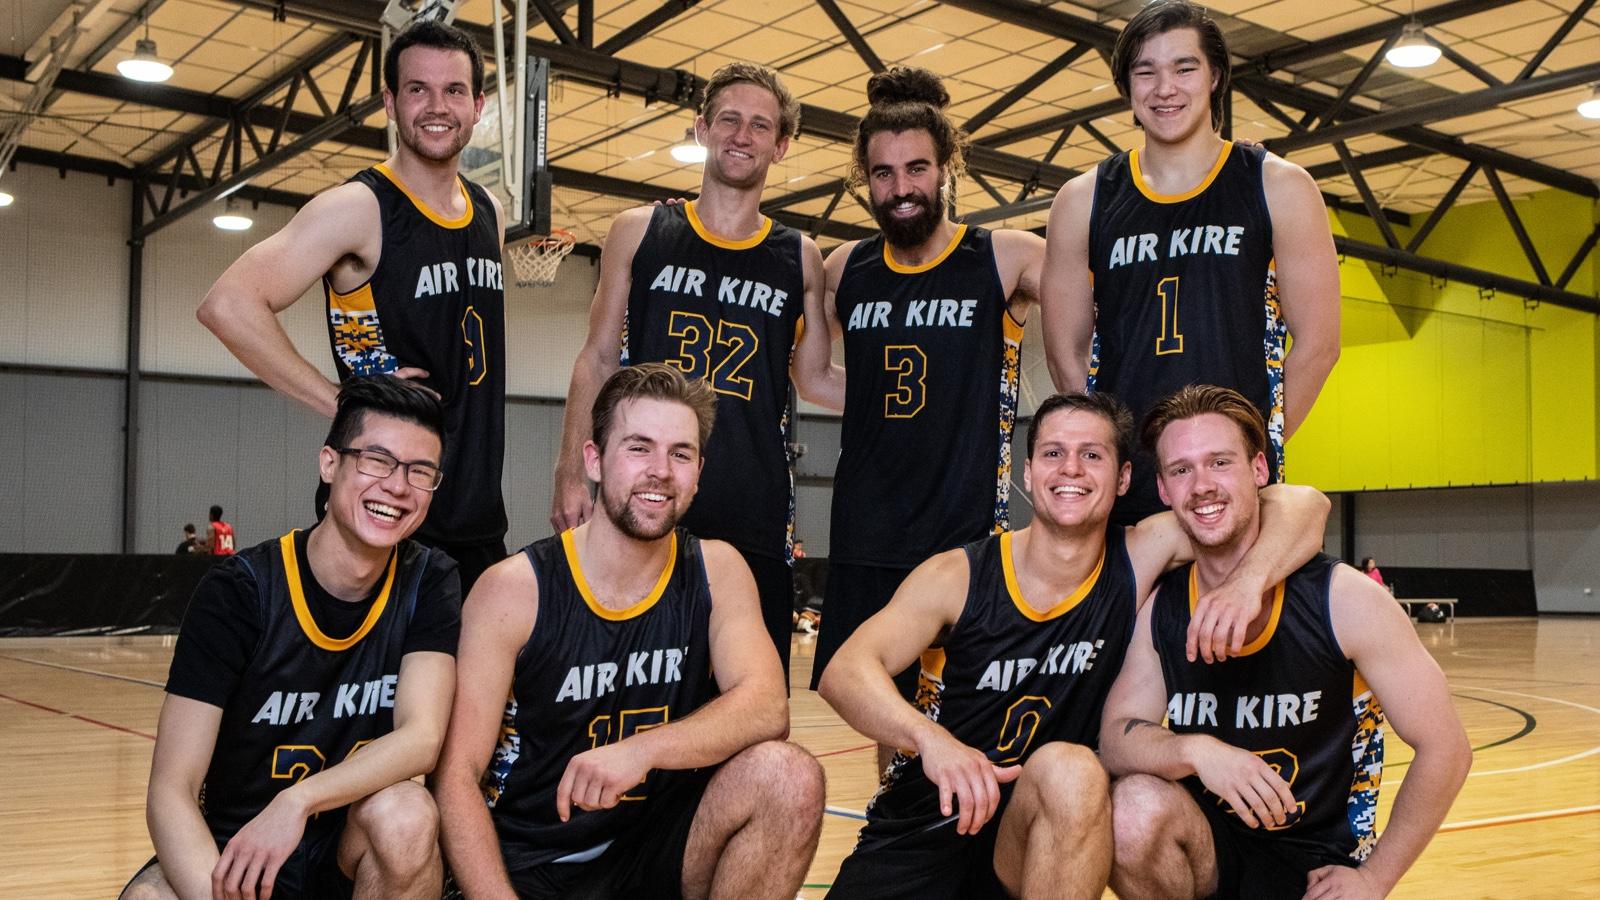 All male Basketball team photo